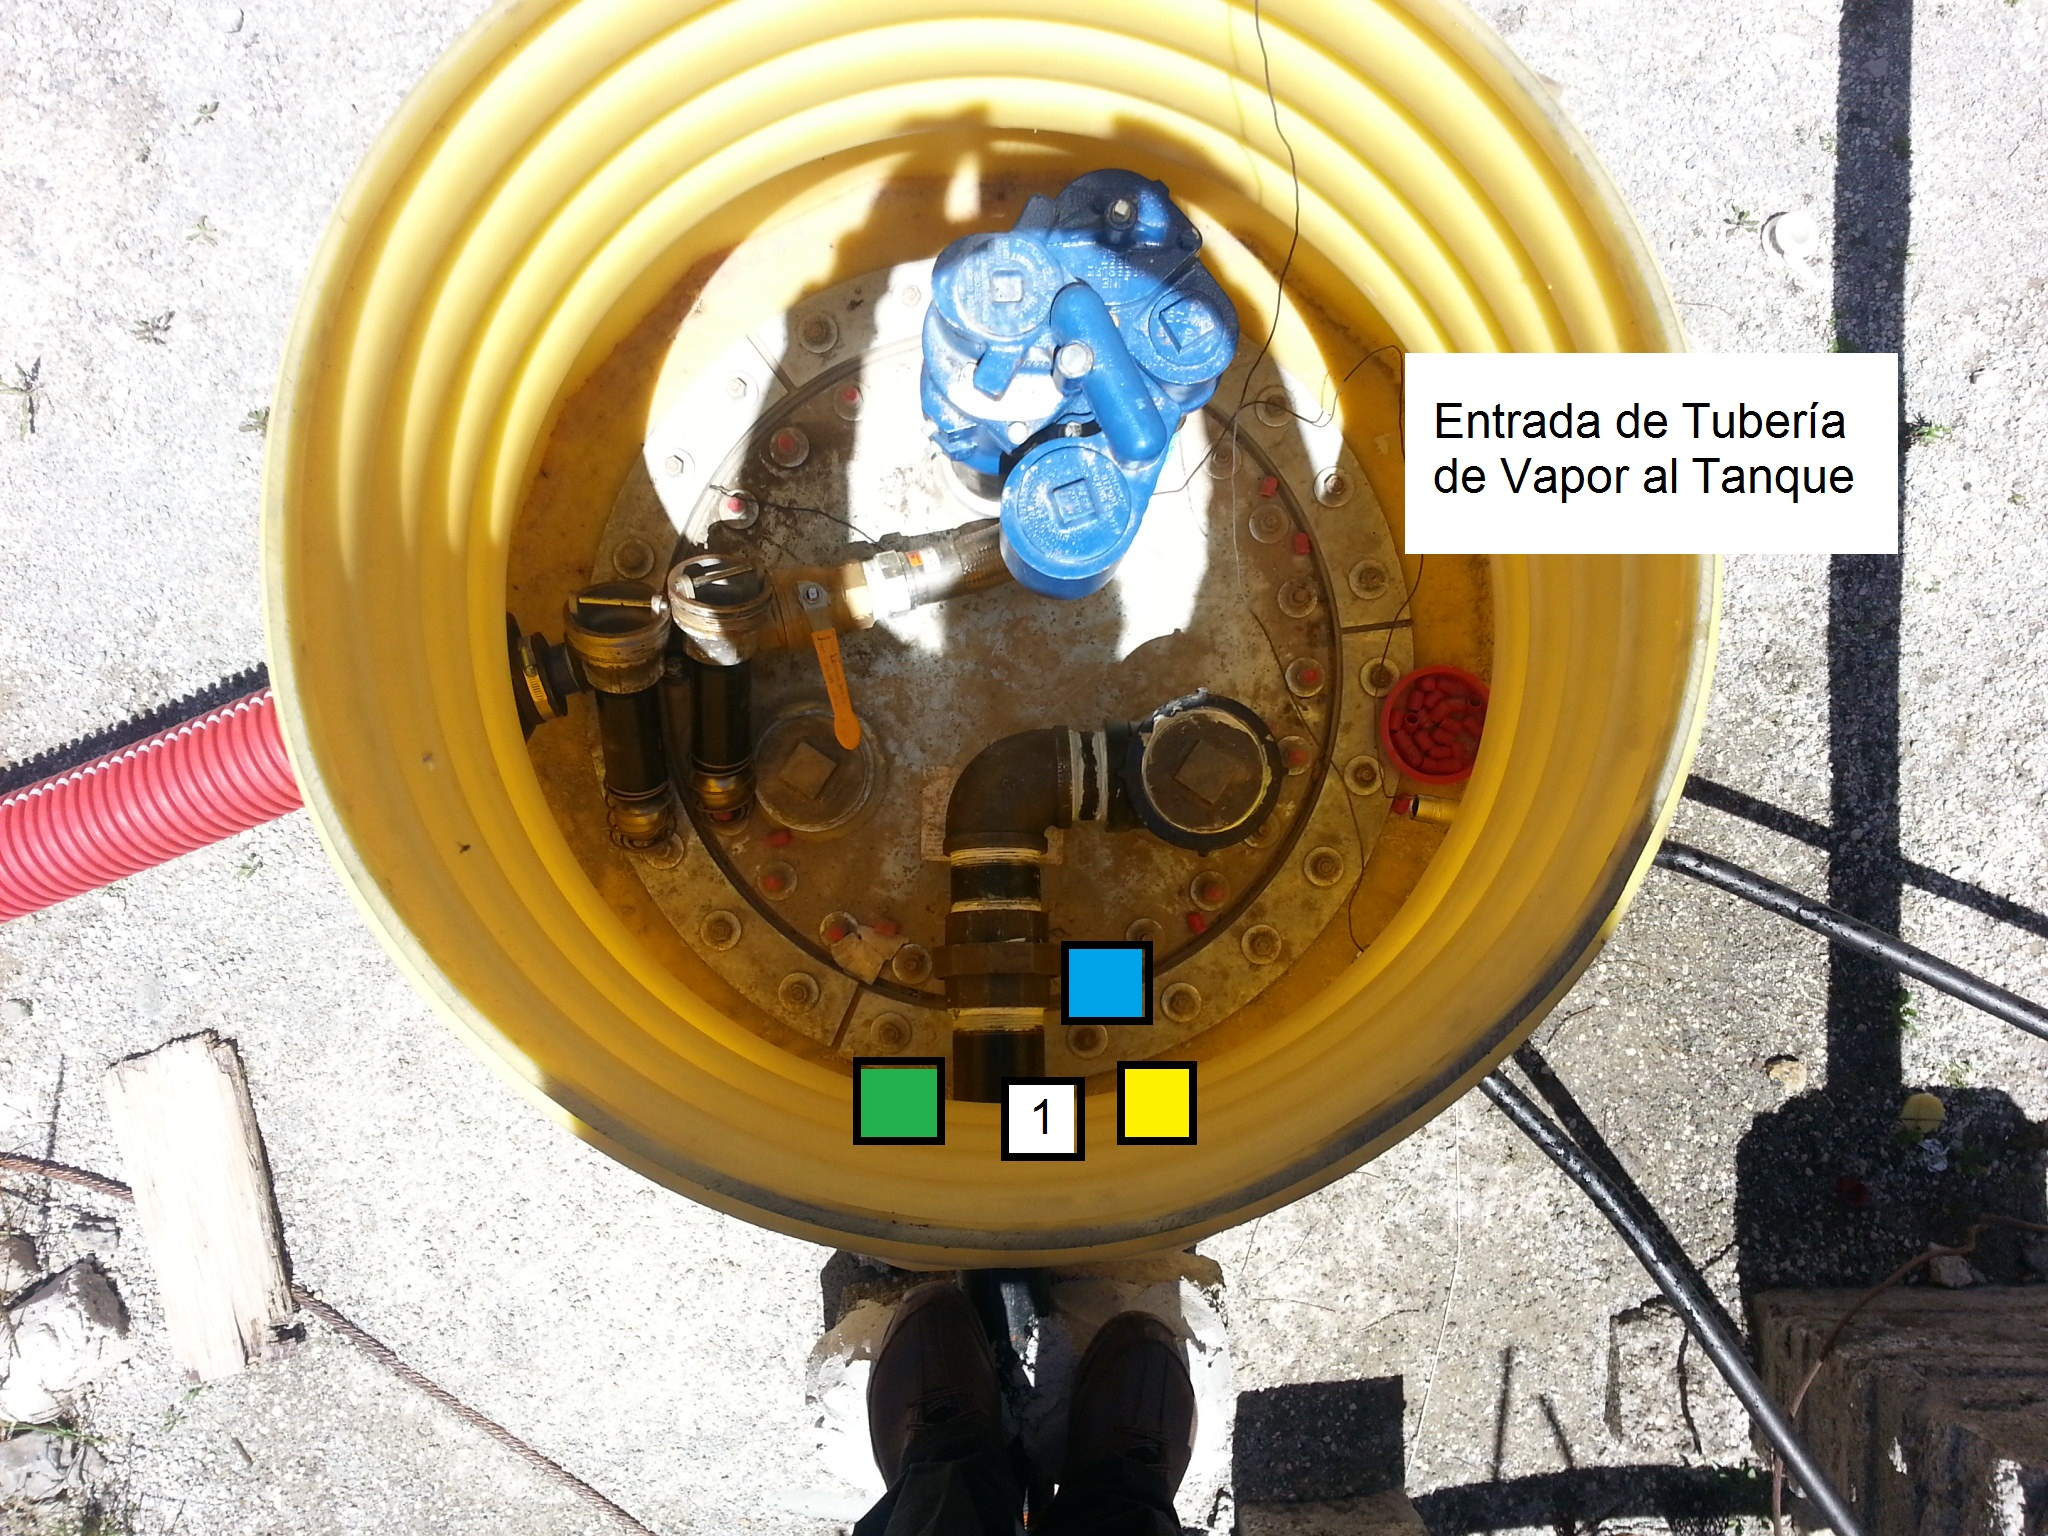 conexion de vapor en tanque